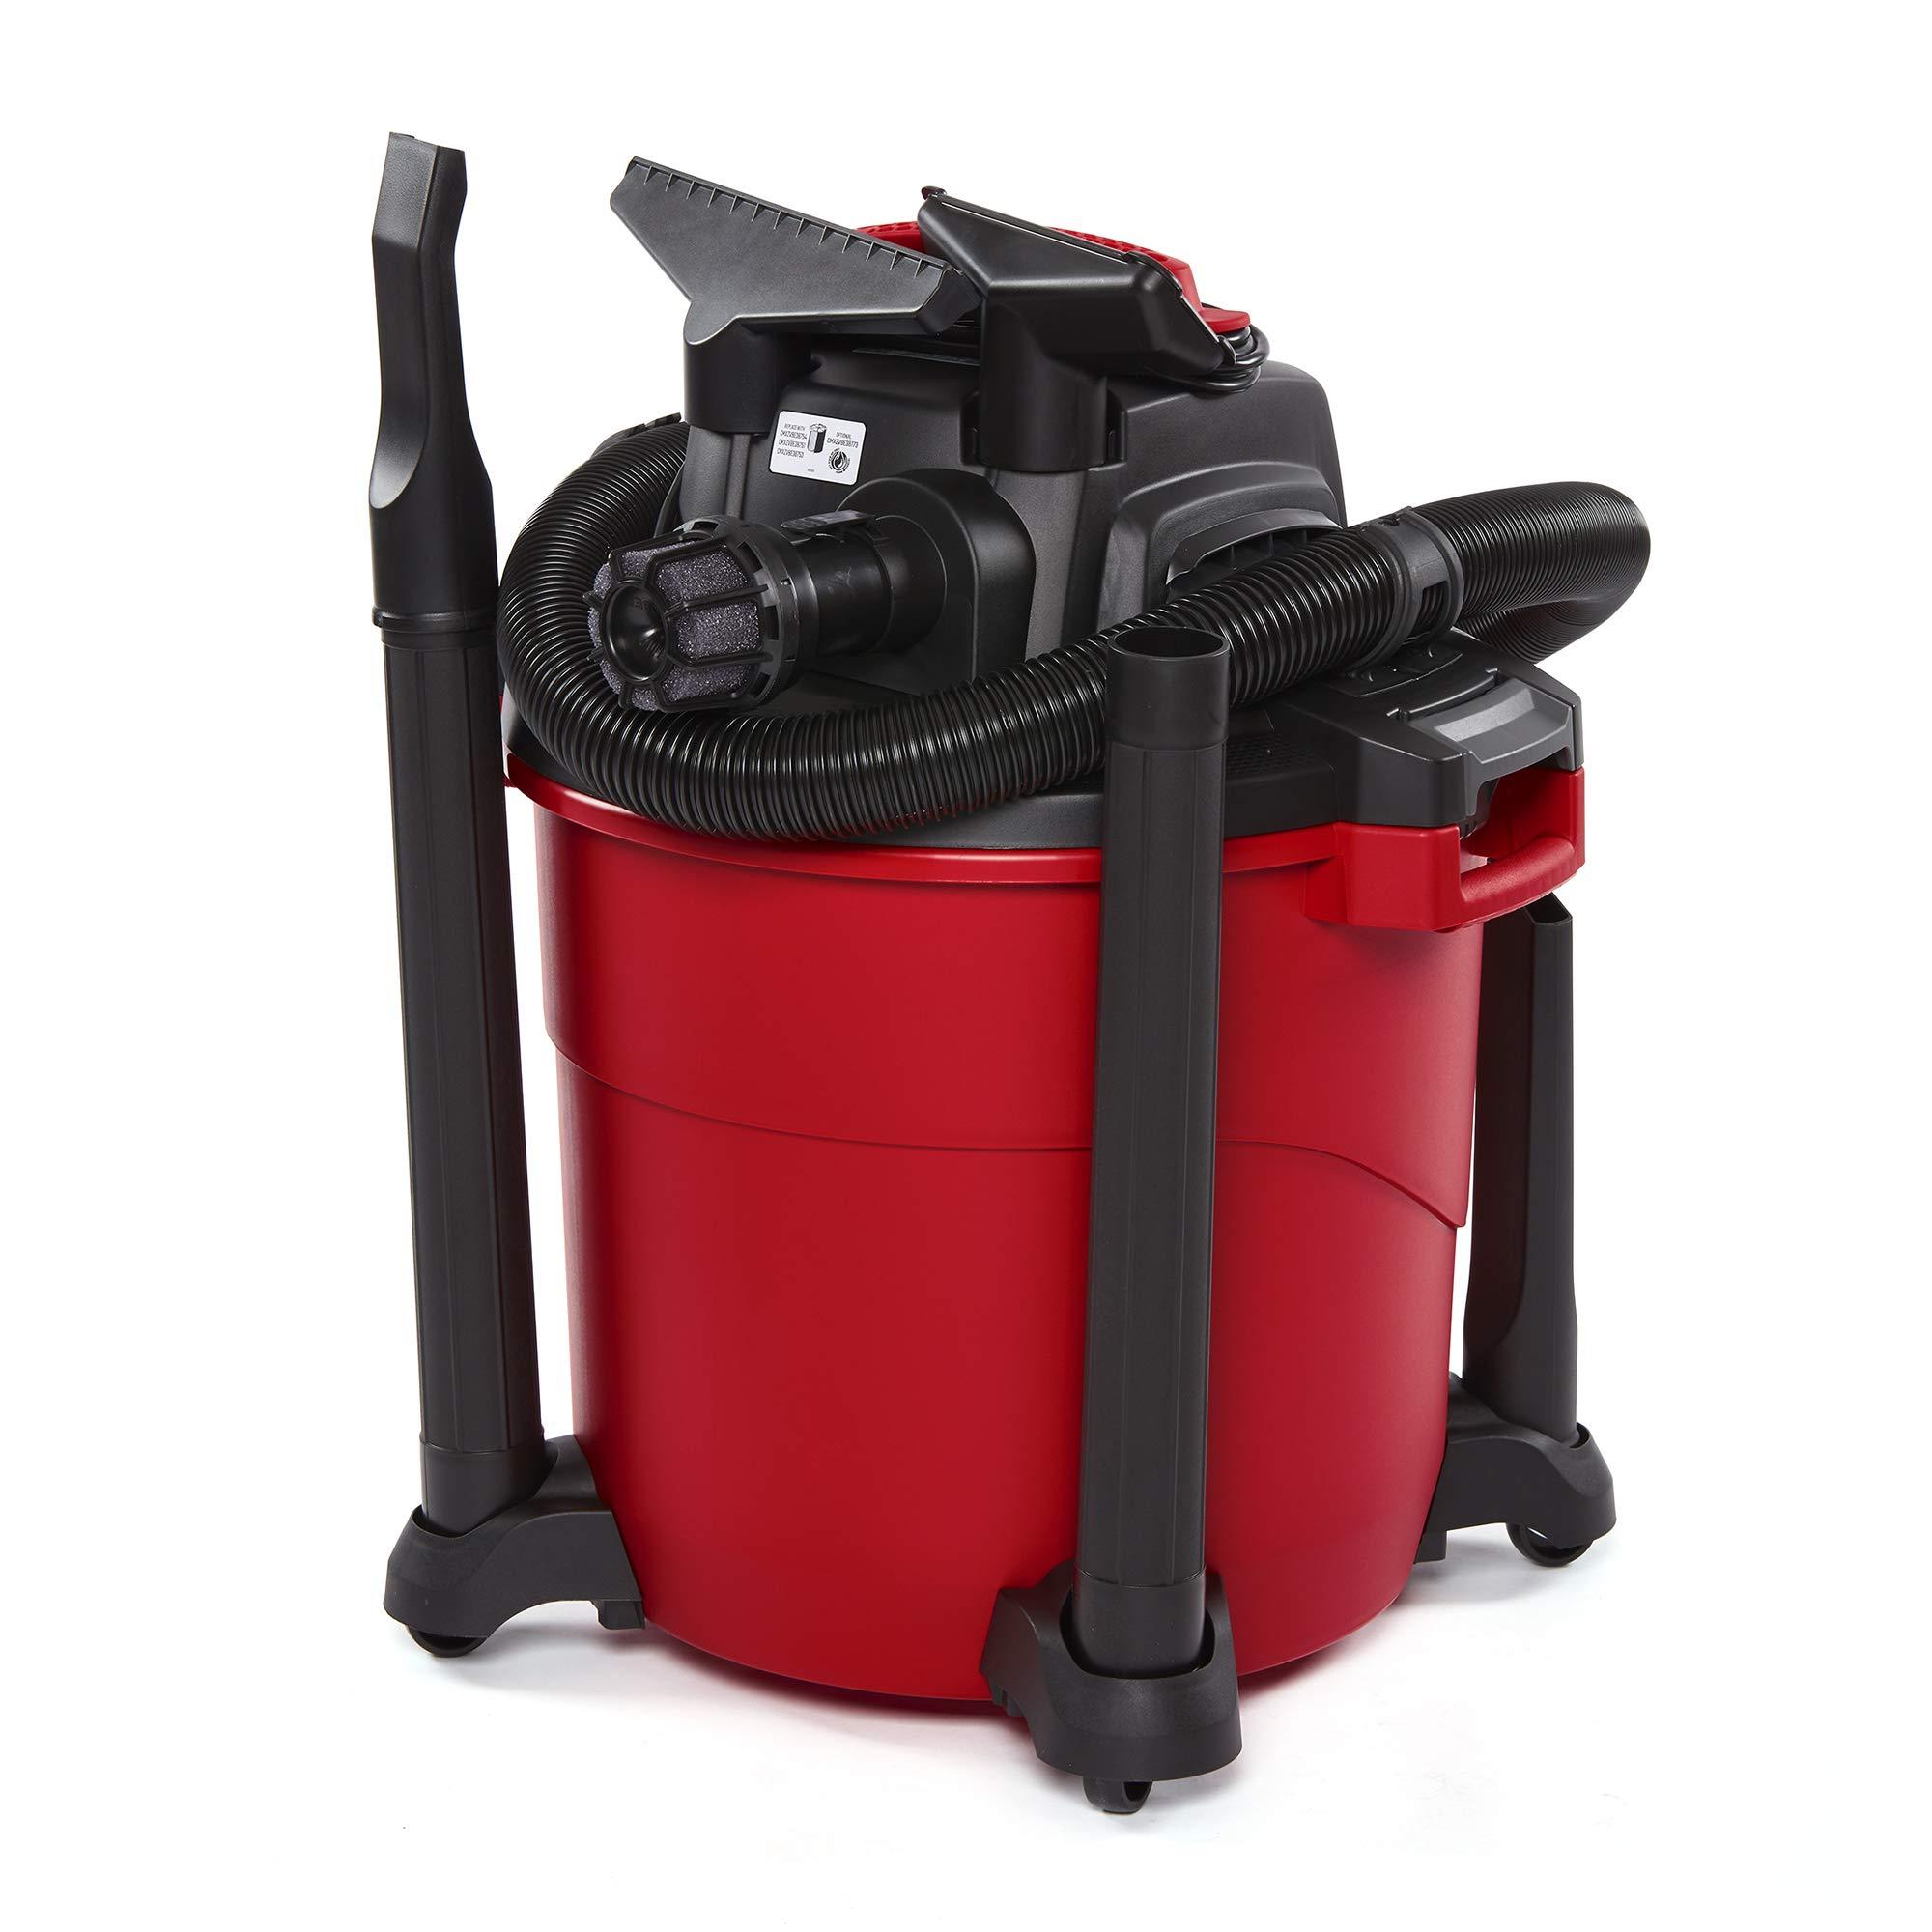 CRAFTSMAN CMXZVBE38660 2-1/2'' Muffler Diffuser Wet/Dry Vac Attachment